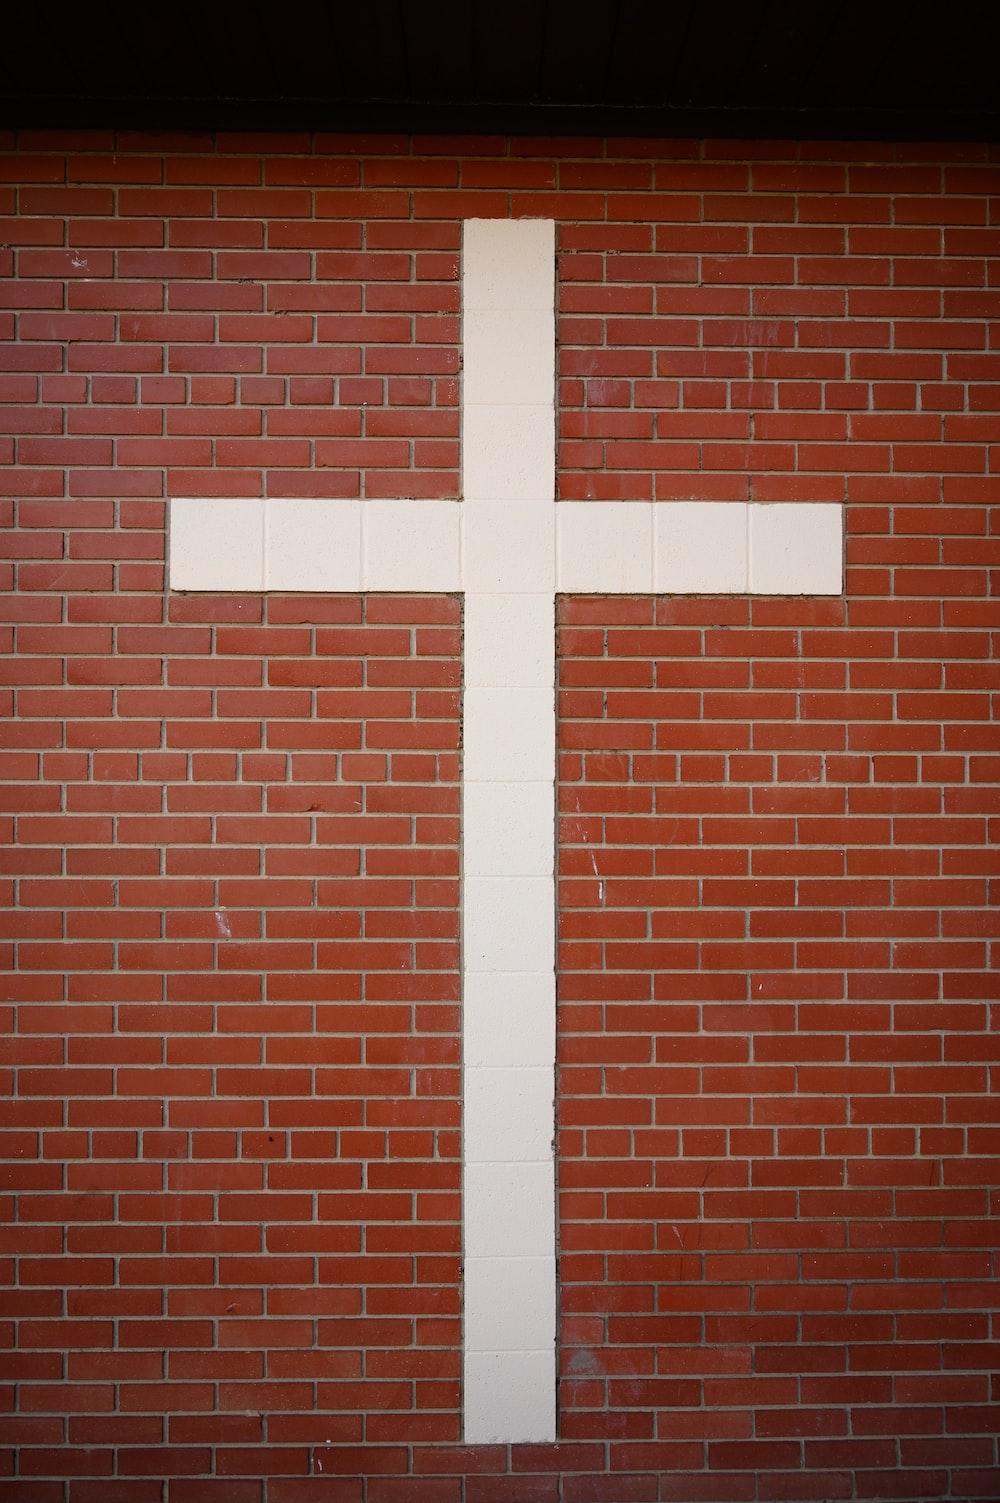 white cross on brown brick wall